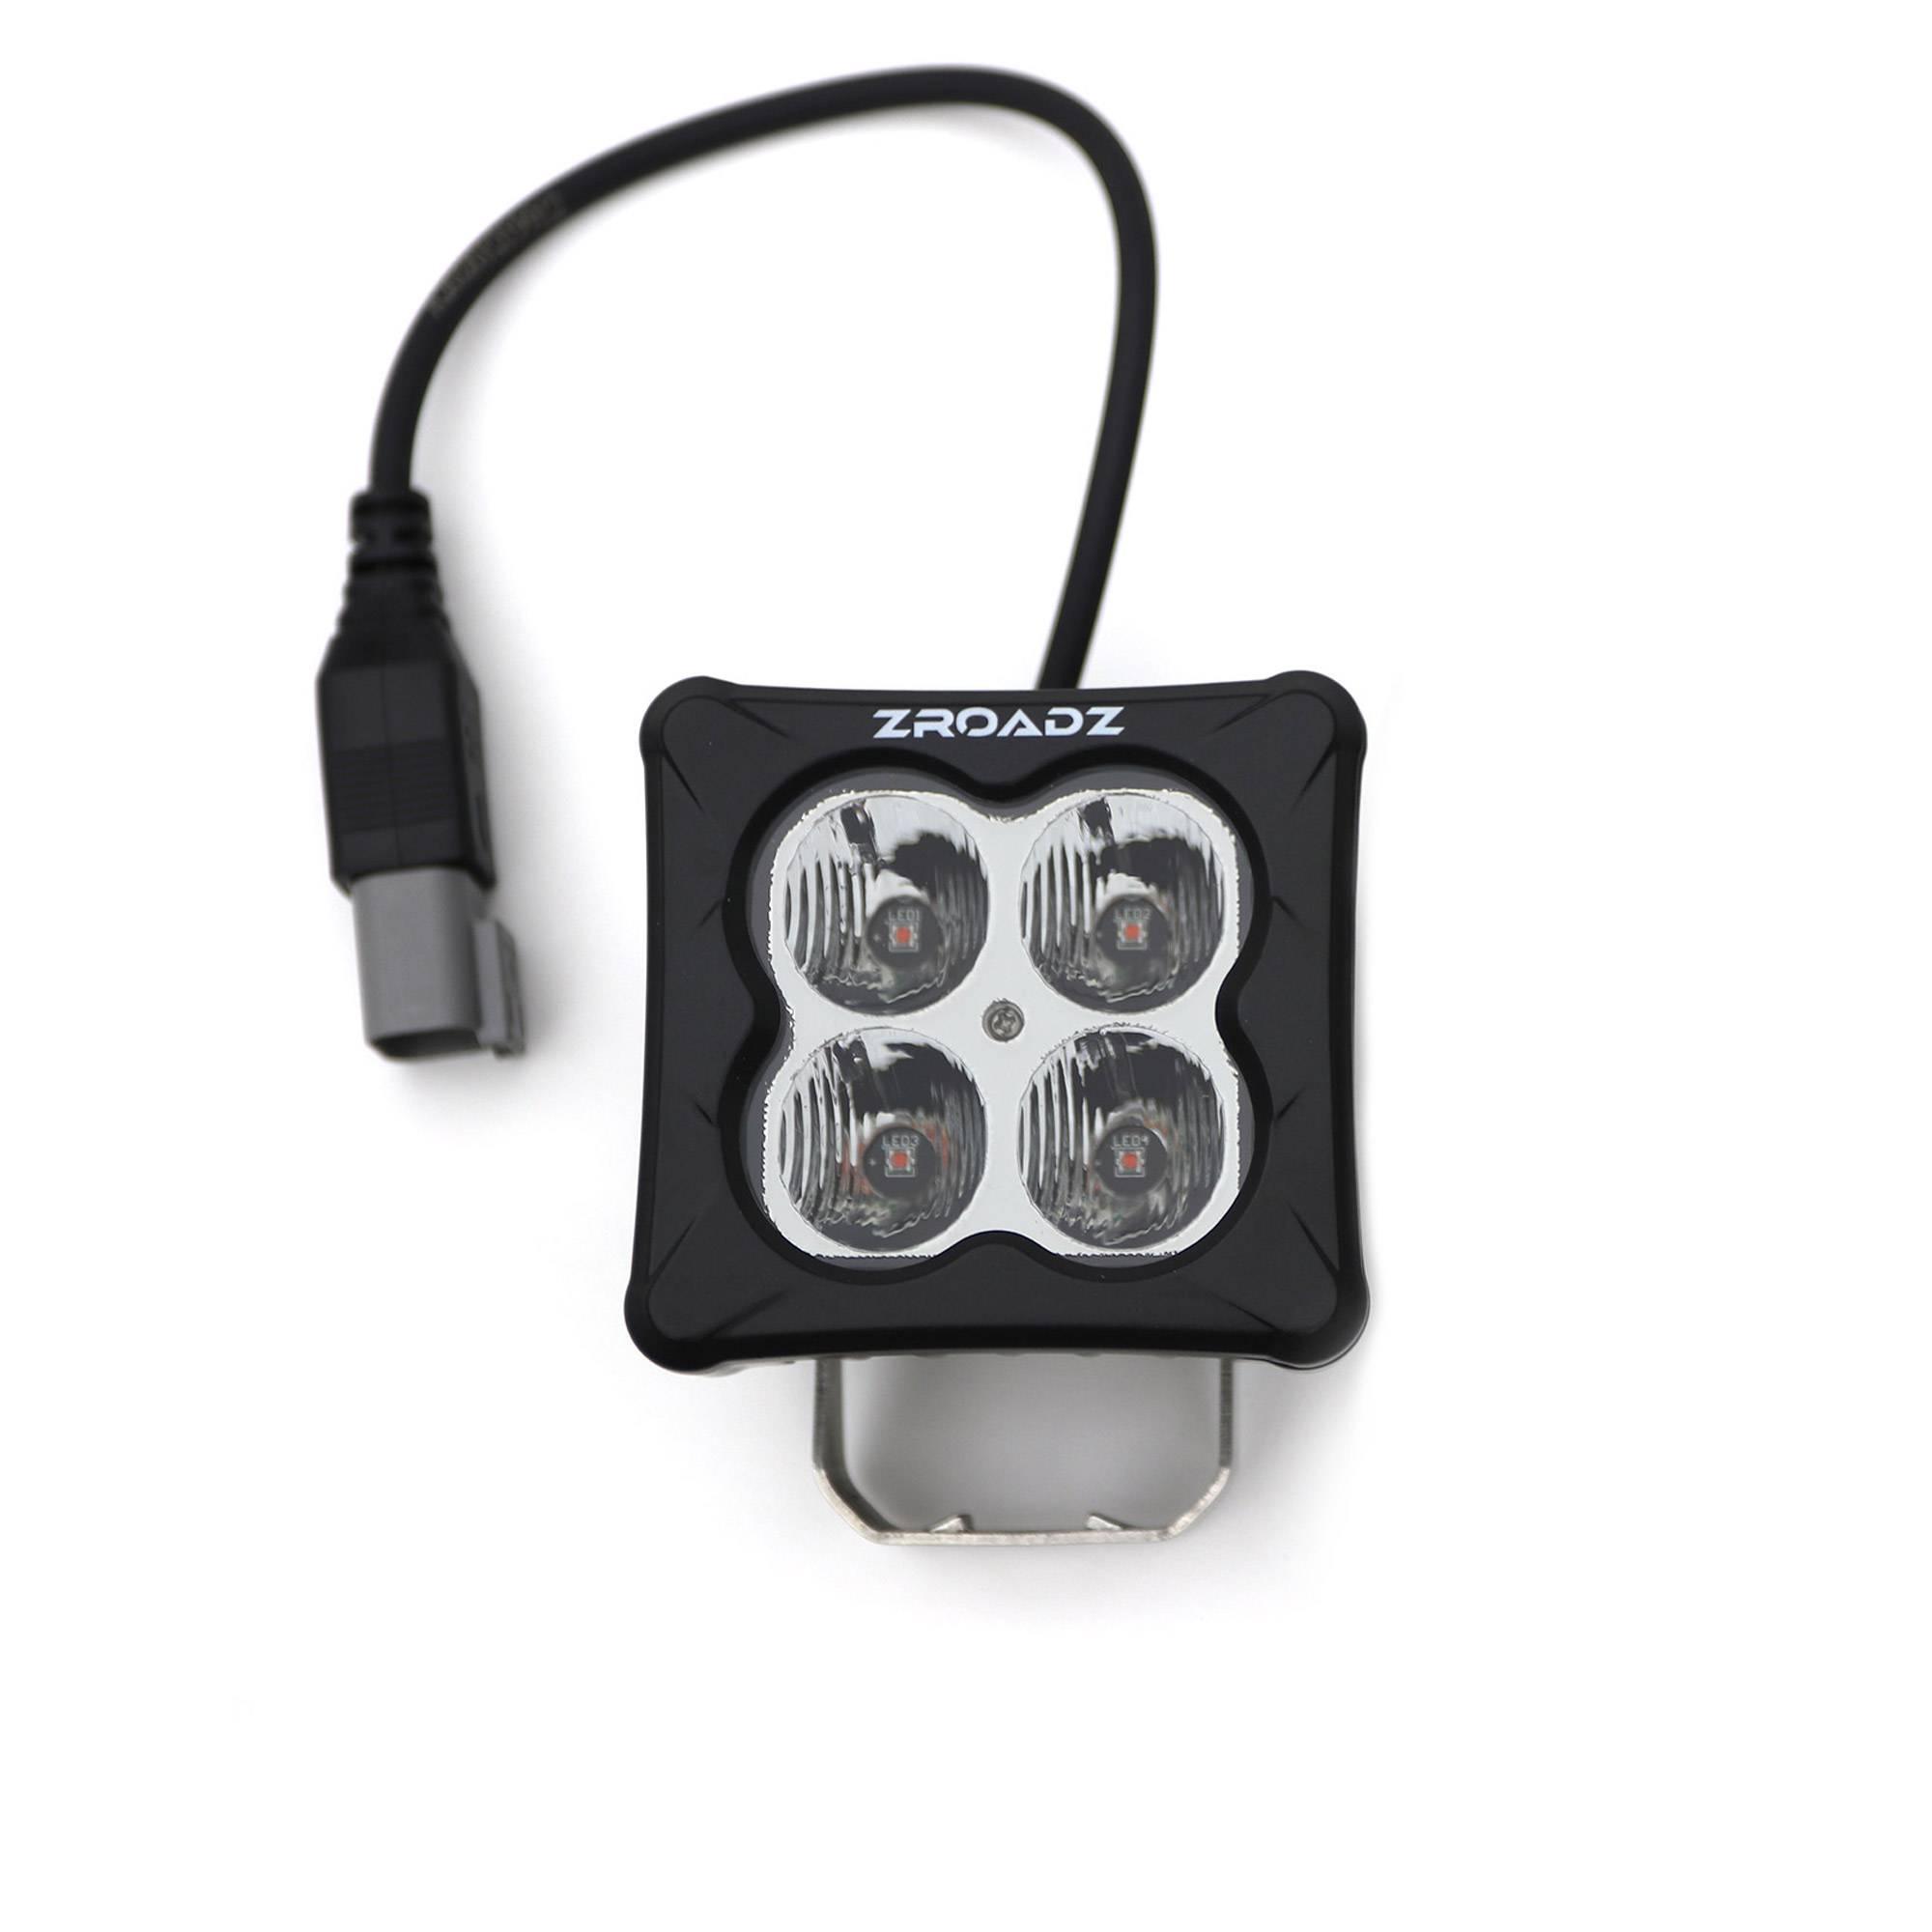 ZROADZ OFF ROAD PRODUCTS - 3 inch ZROADZ LED Light Pod, G2 Series, Amber, Flood Beam, 1 Piece - PN #Z30BC12W-D3A